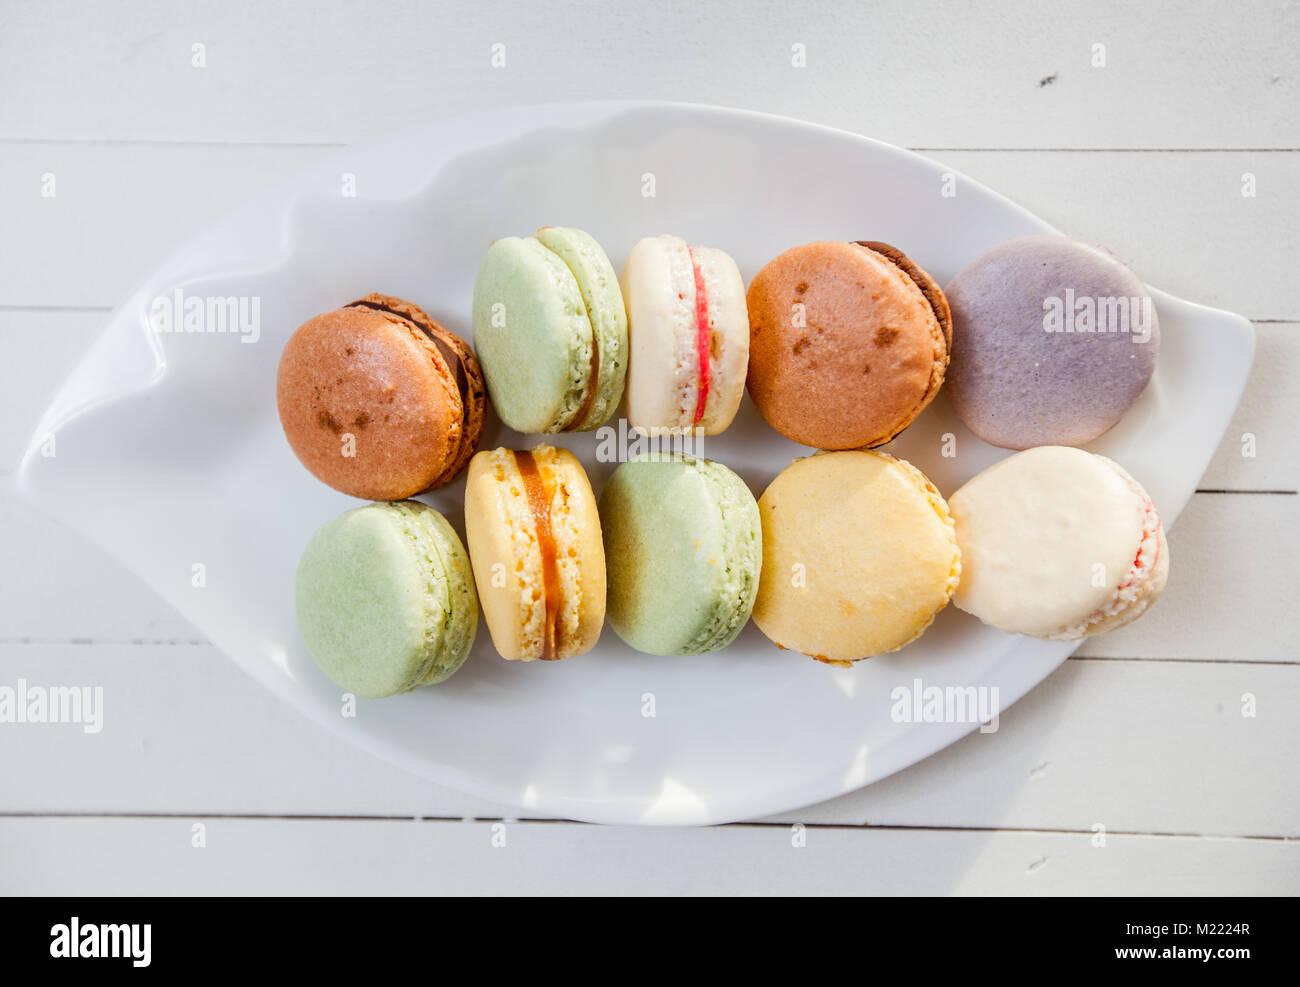 Bunten Kuchen Franzosische Macarons Handgefertigte Almond Cookies